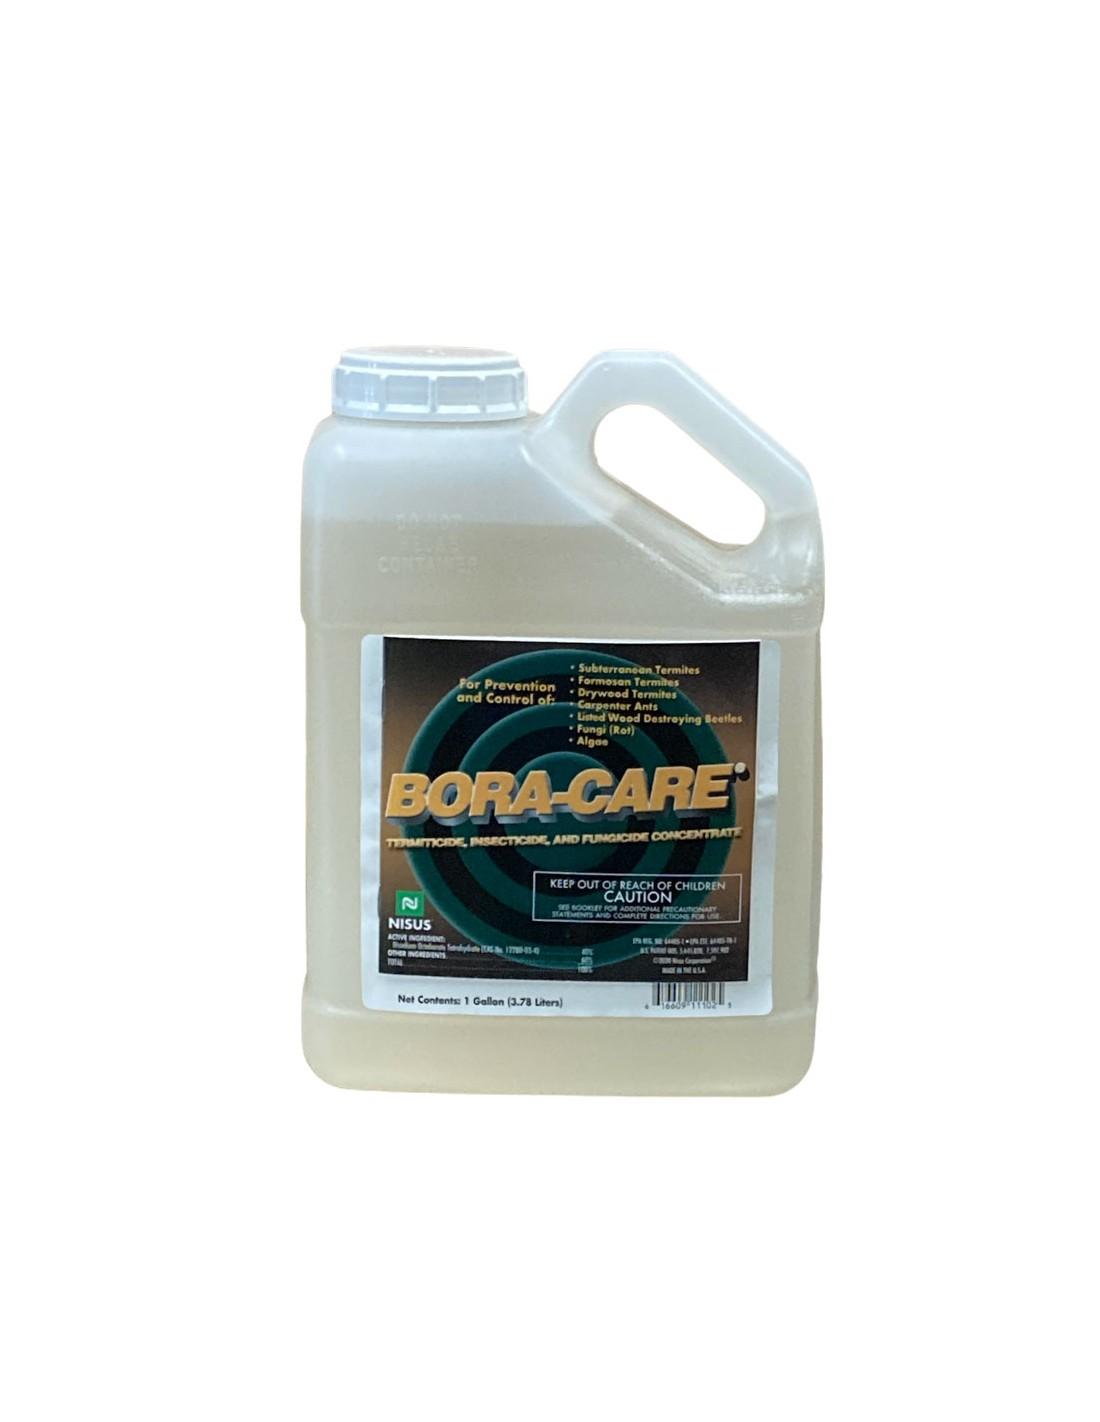 will the chapin sprayer make foam for termites